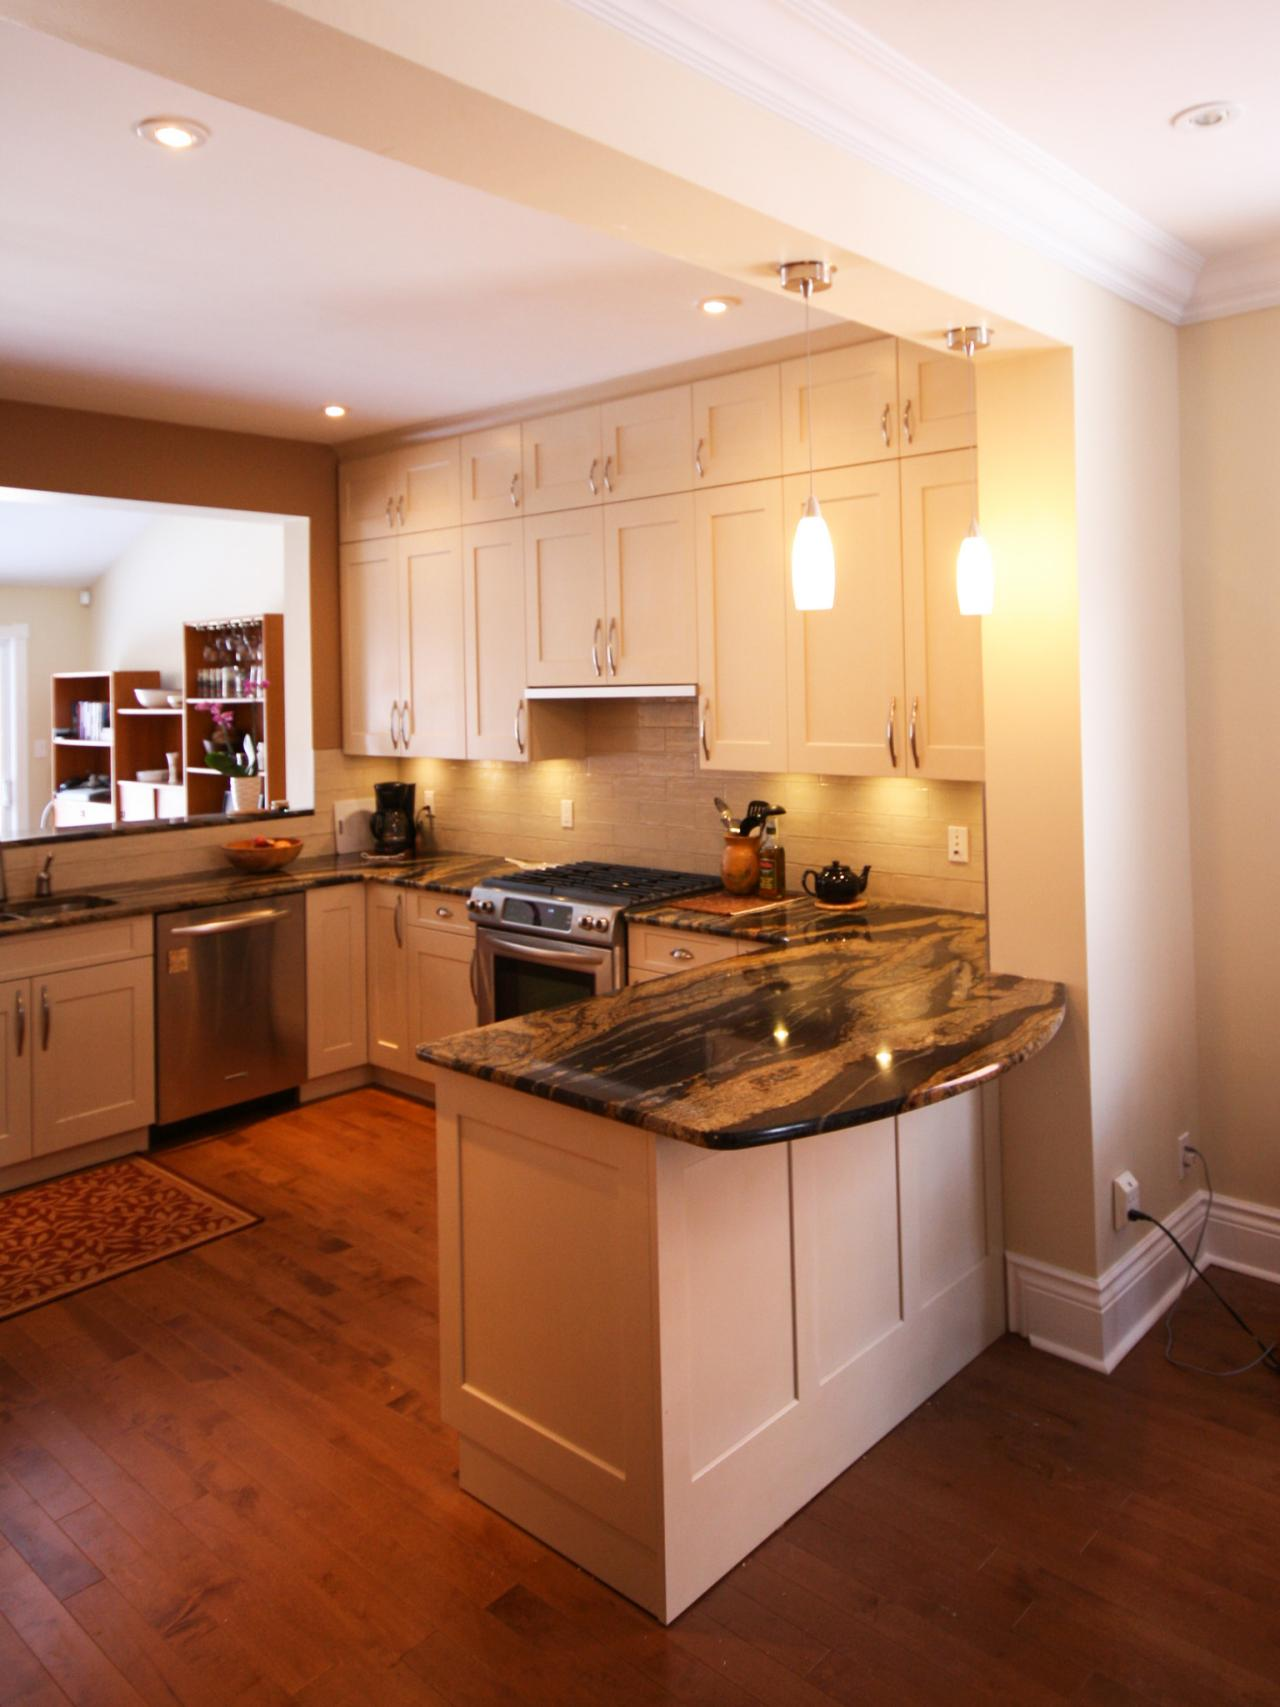 u shaped kitchen layouts with island photo - 1